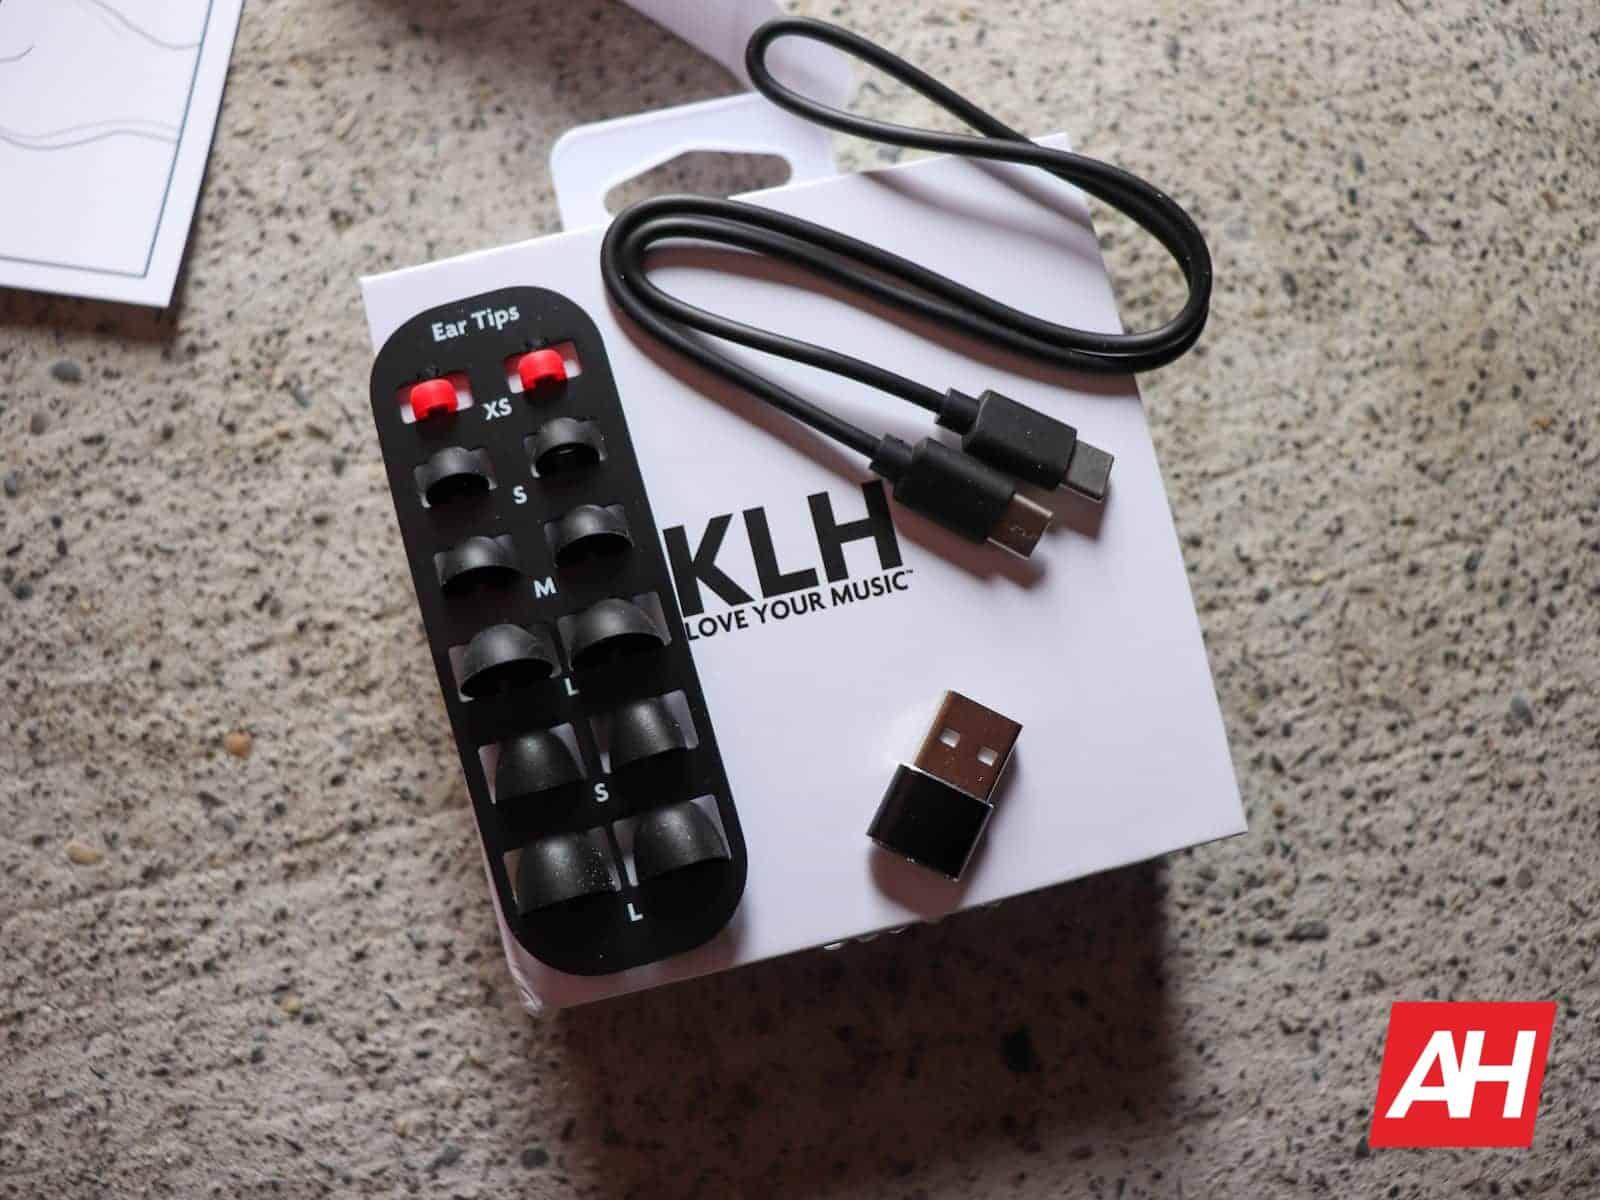 01 0 KLH Fusion Review hardware DG AH 2021